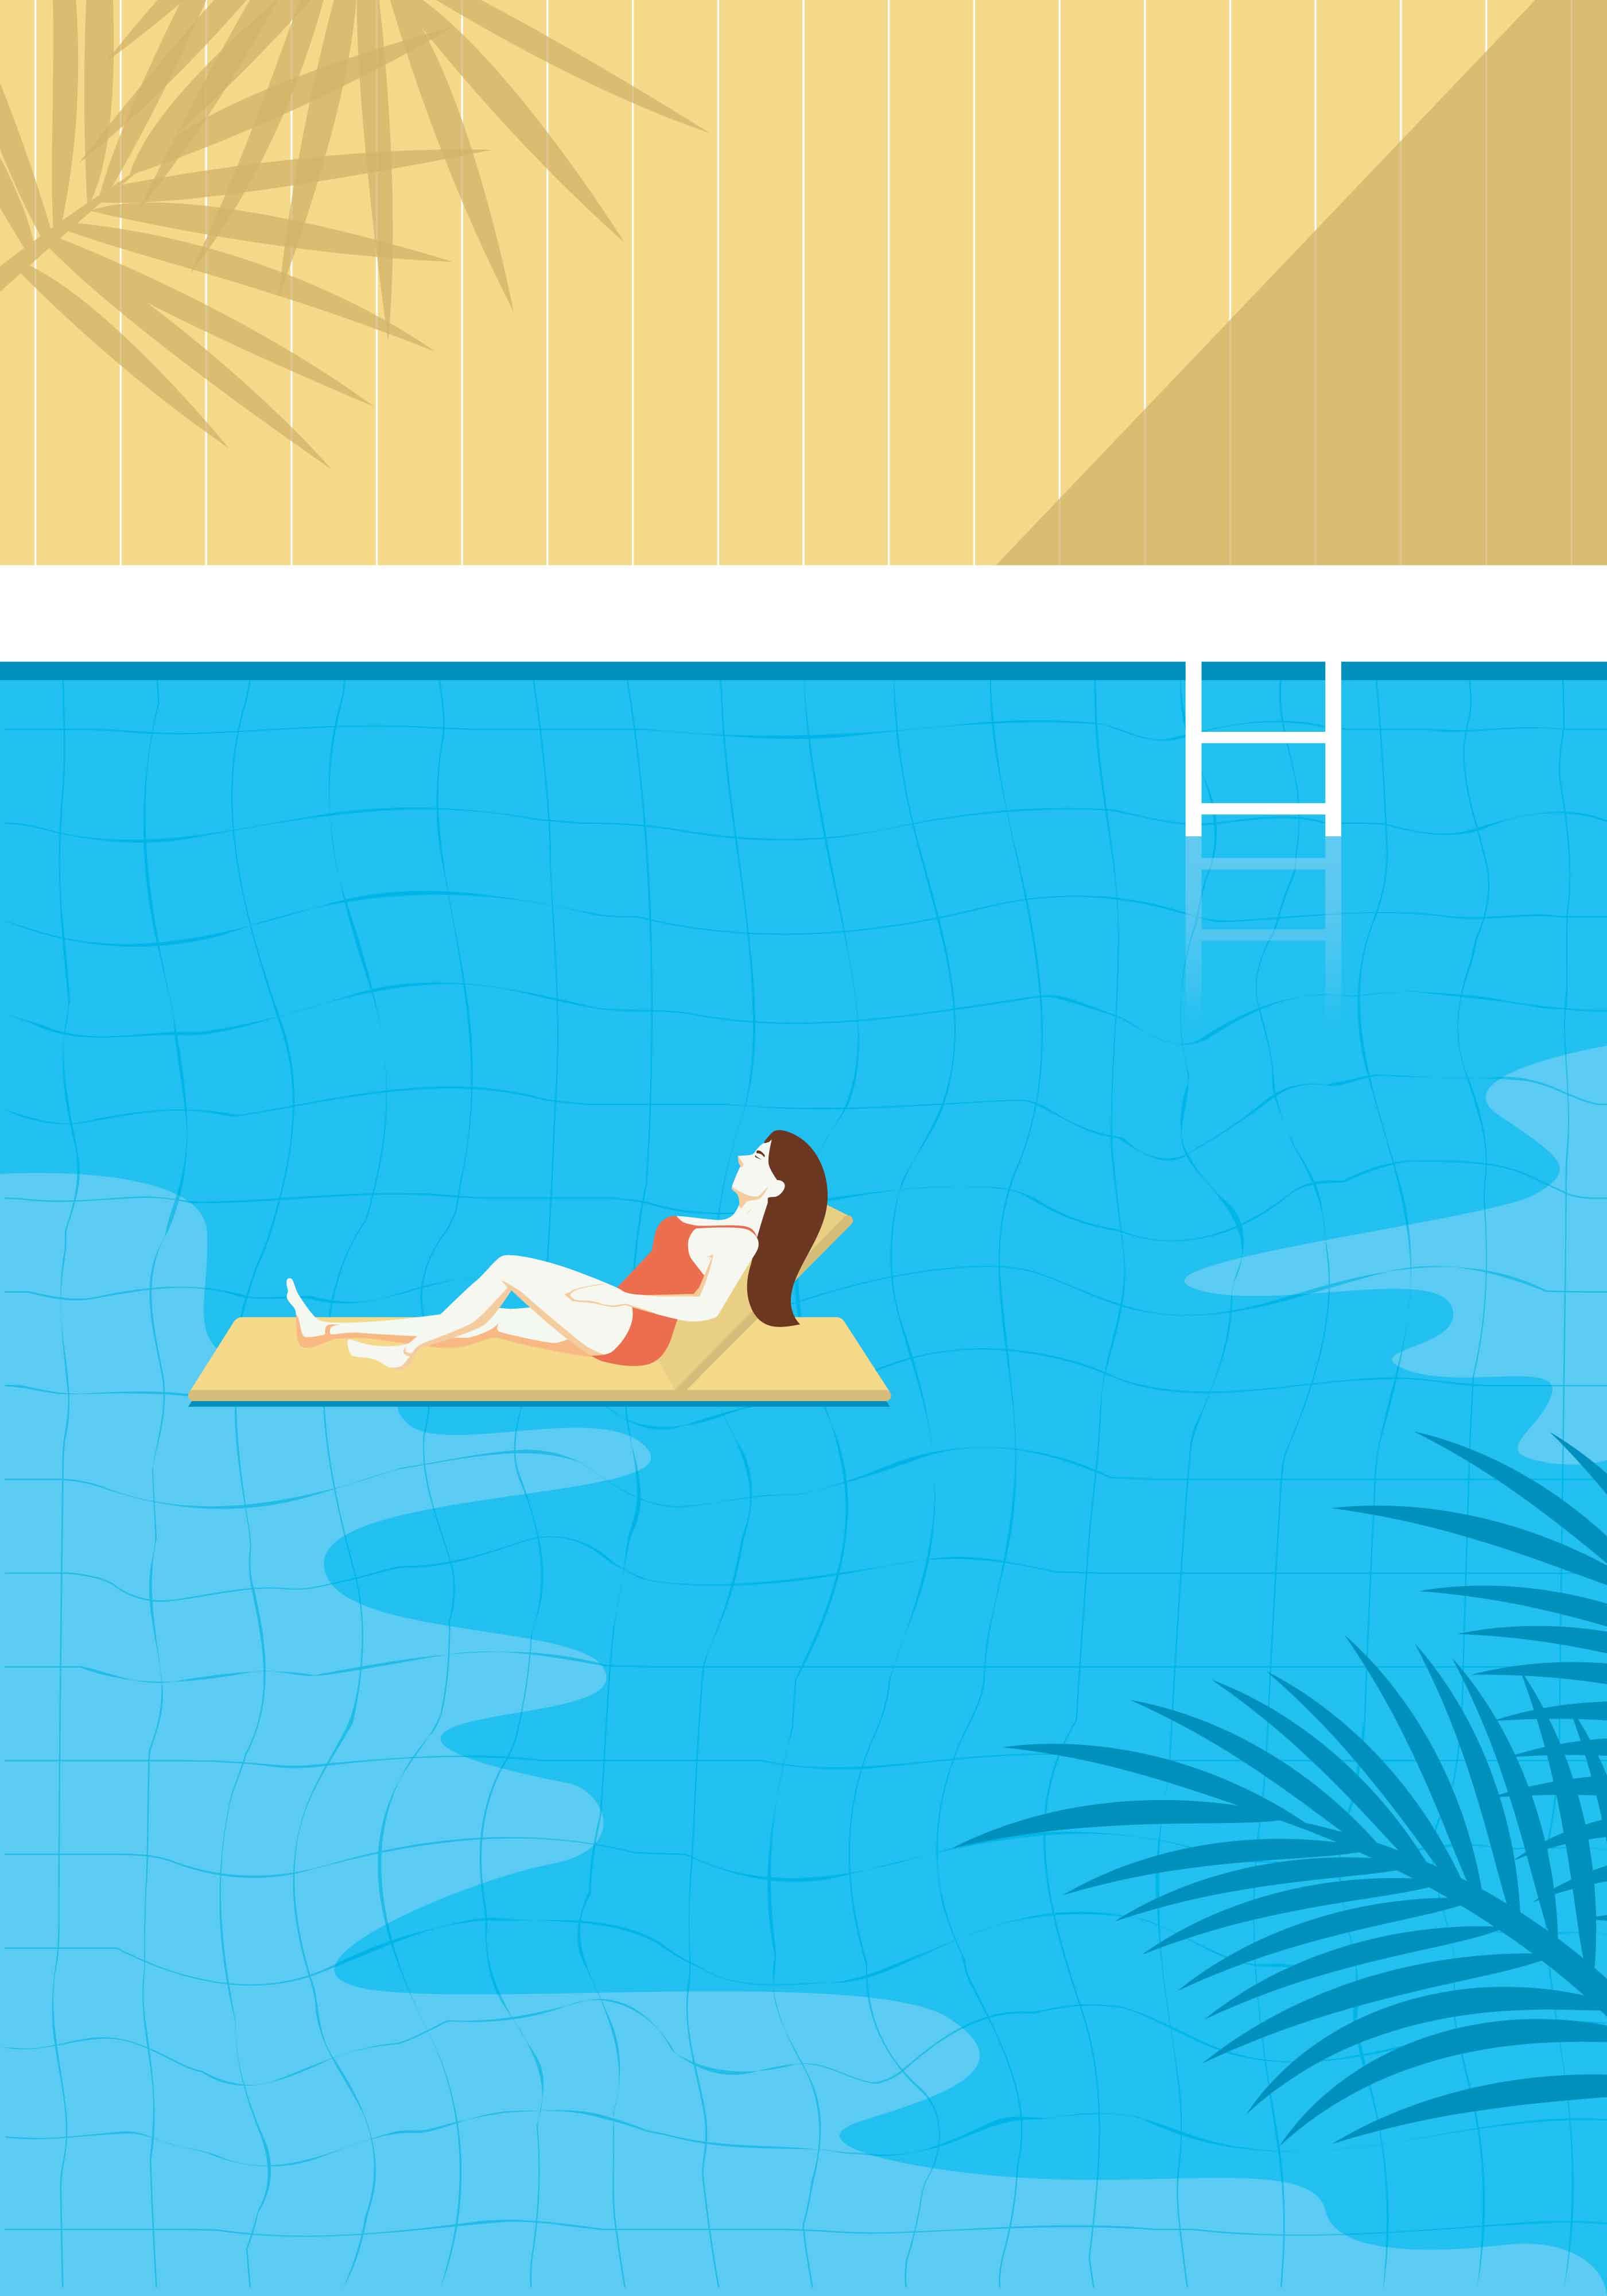 Free Swimming Pool: Vintage Swimming Pool Illustration